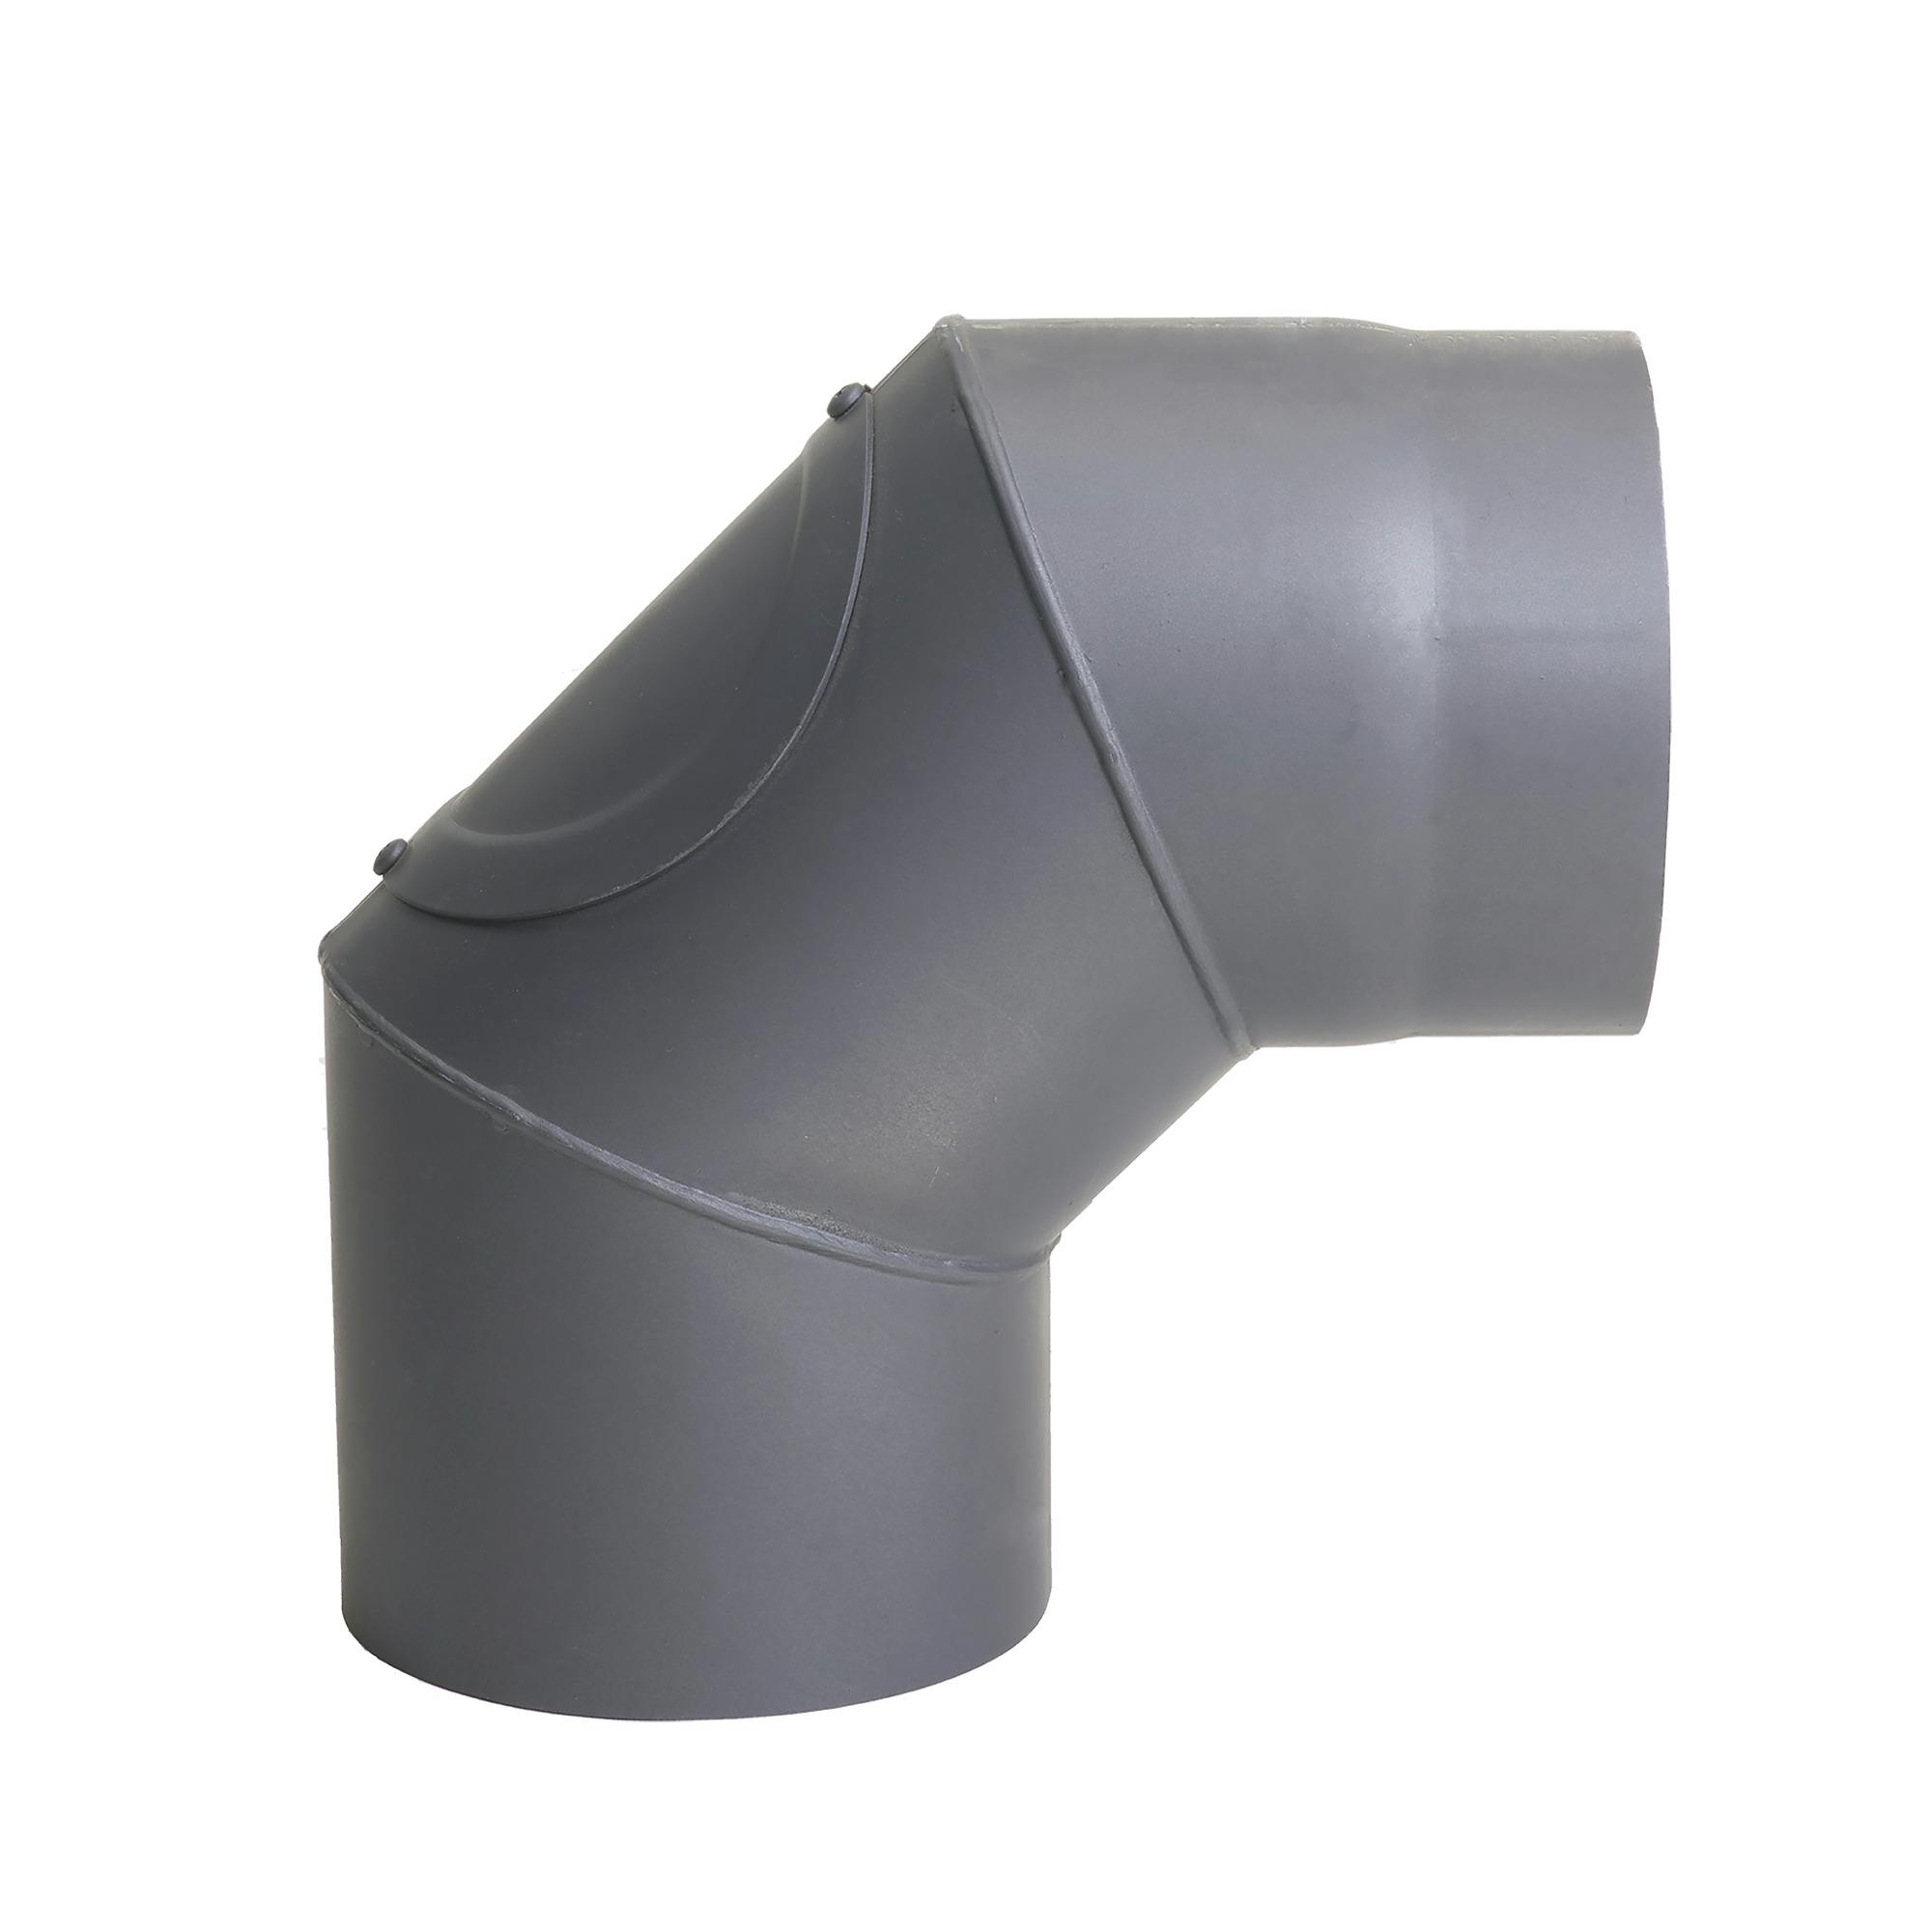 Livinflame kachelpijp bocht 90° enkelwandig met opening en afdekkapje Ø 150 mm